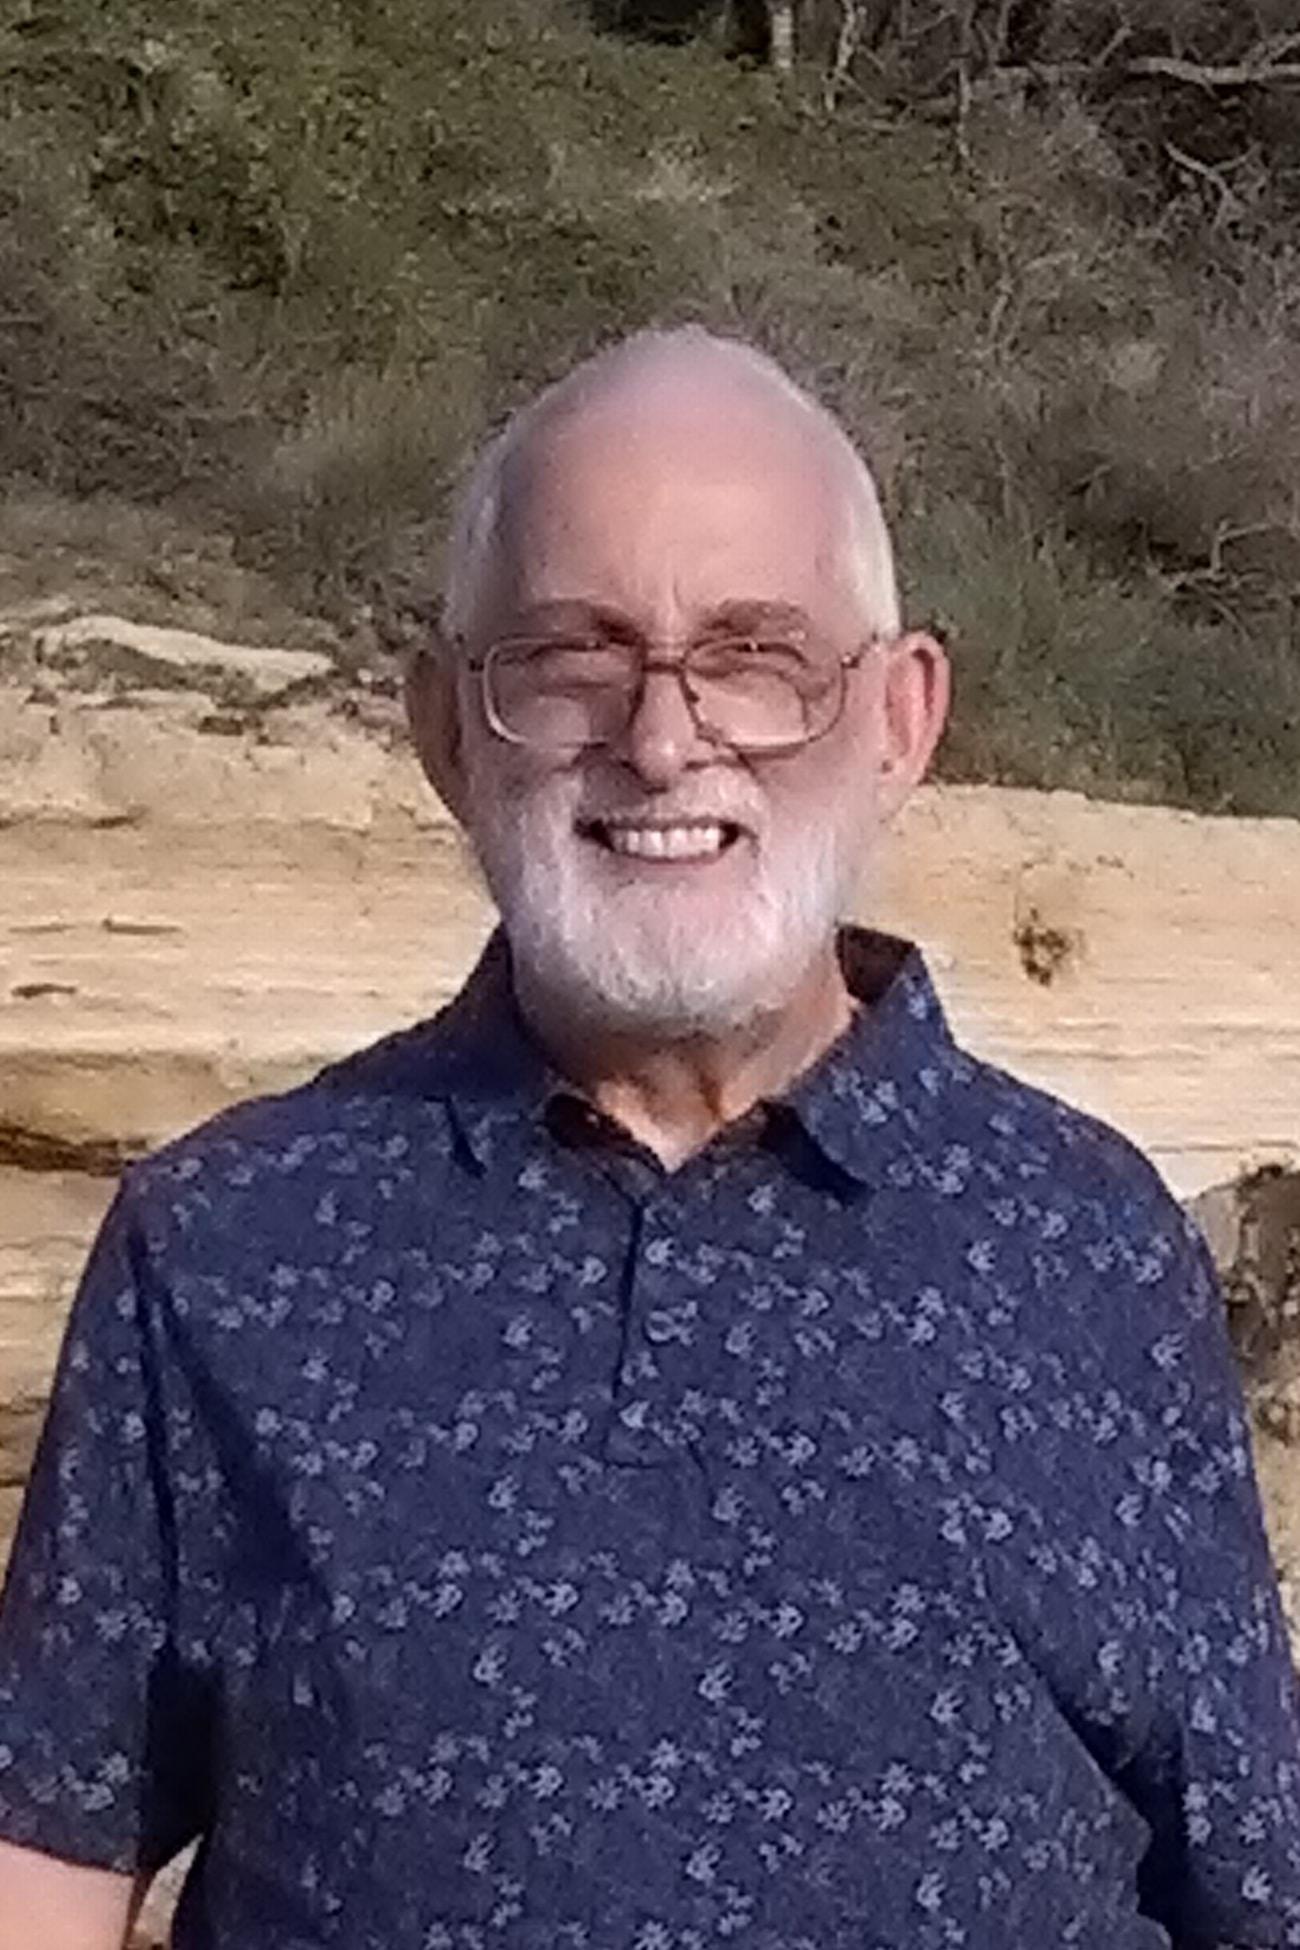 Avatar of user Andrew Buchanan